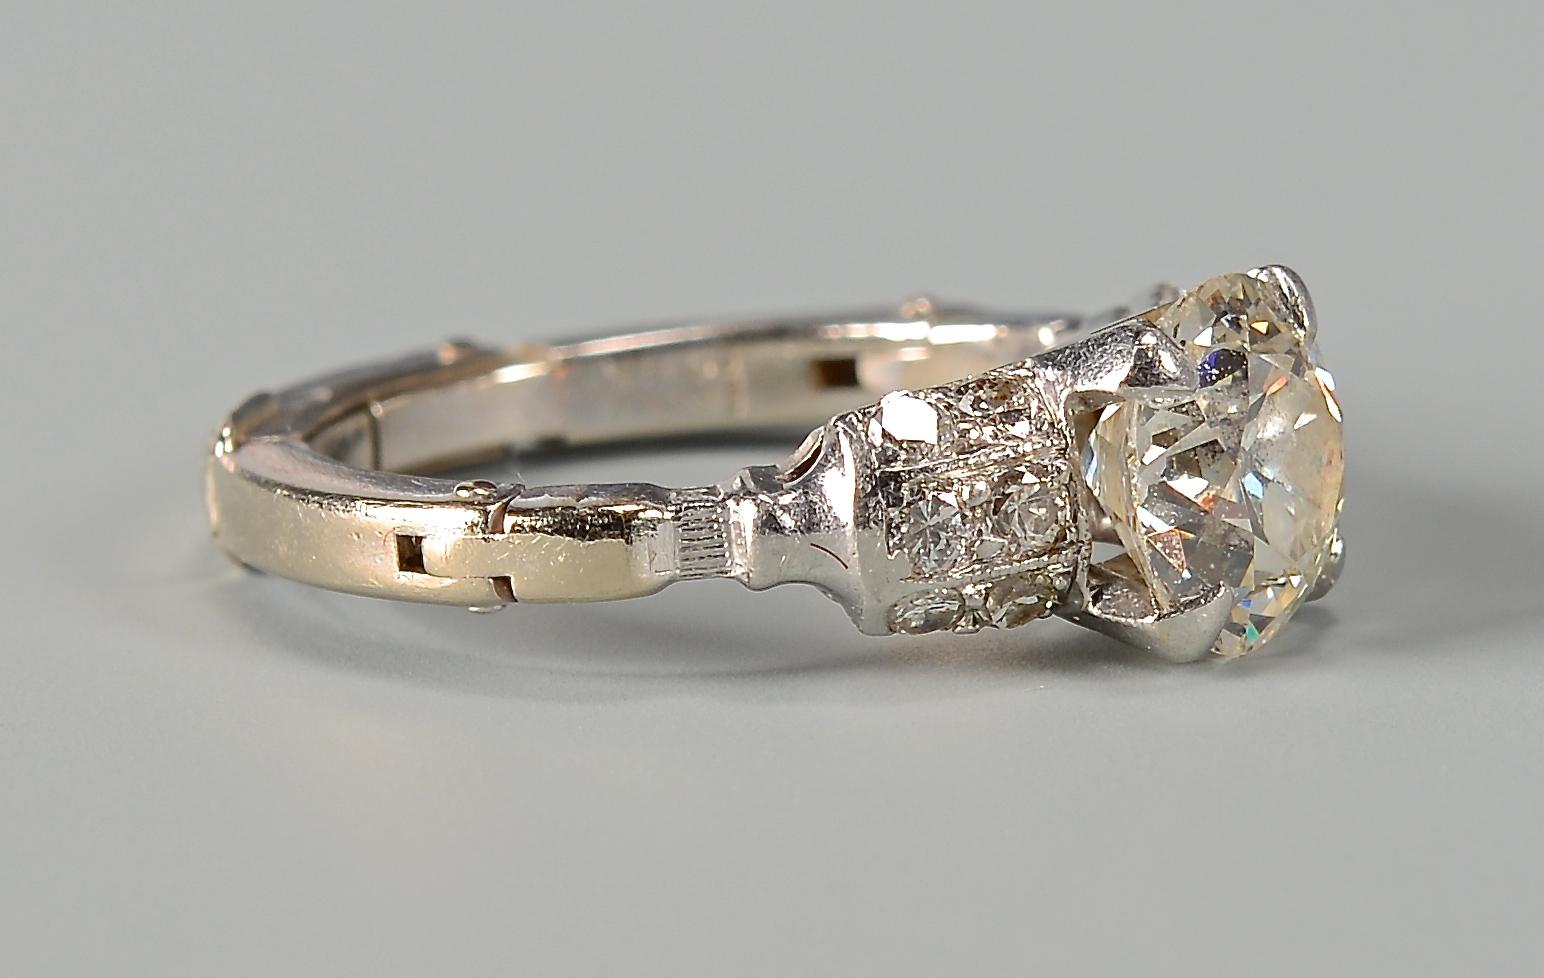 Lot 397 1 35 Carat Old Mine Cut Diamond Ring